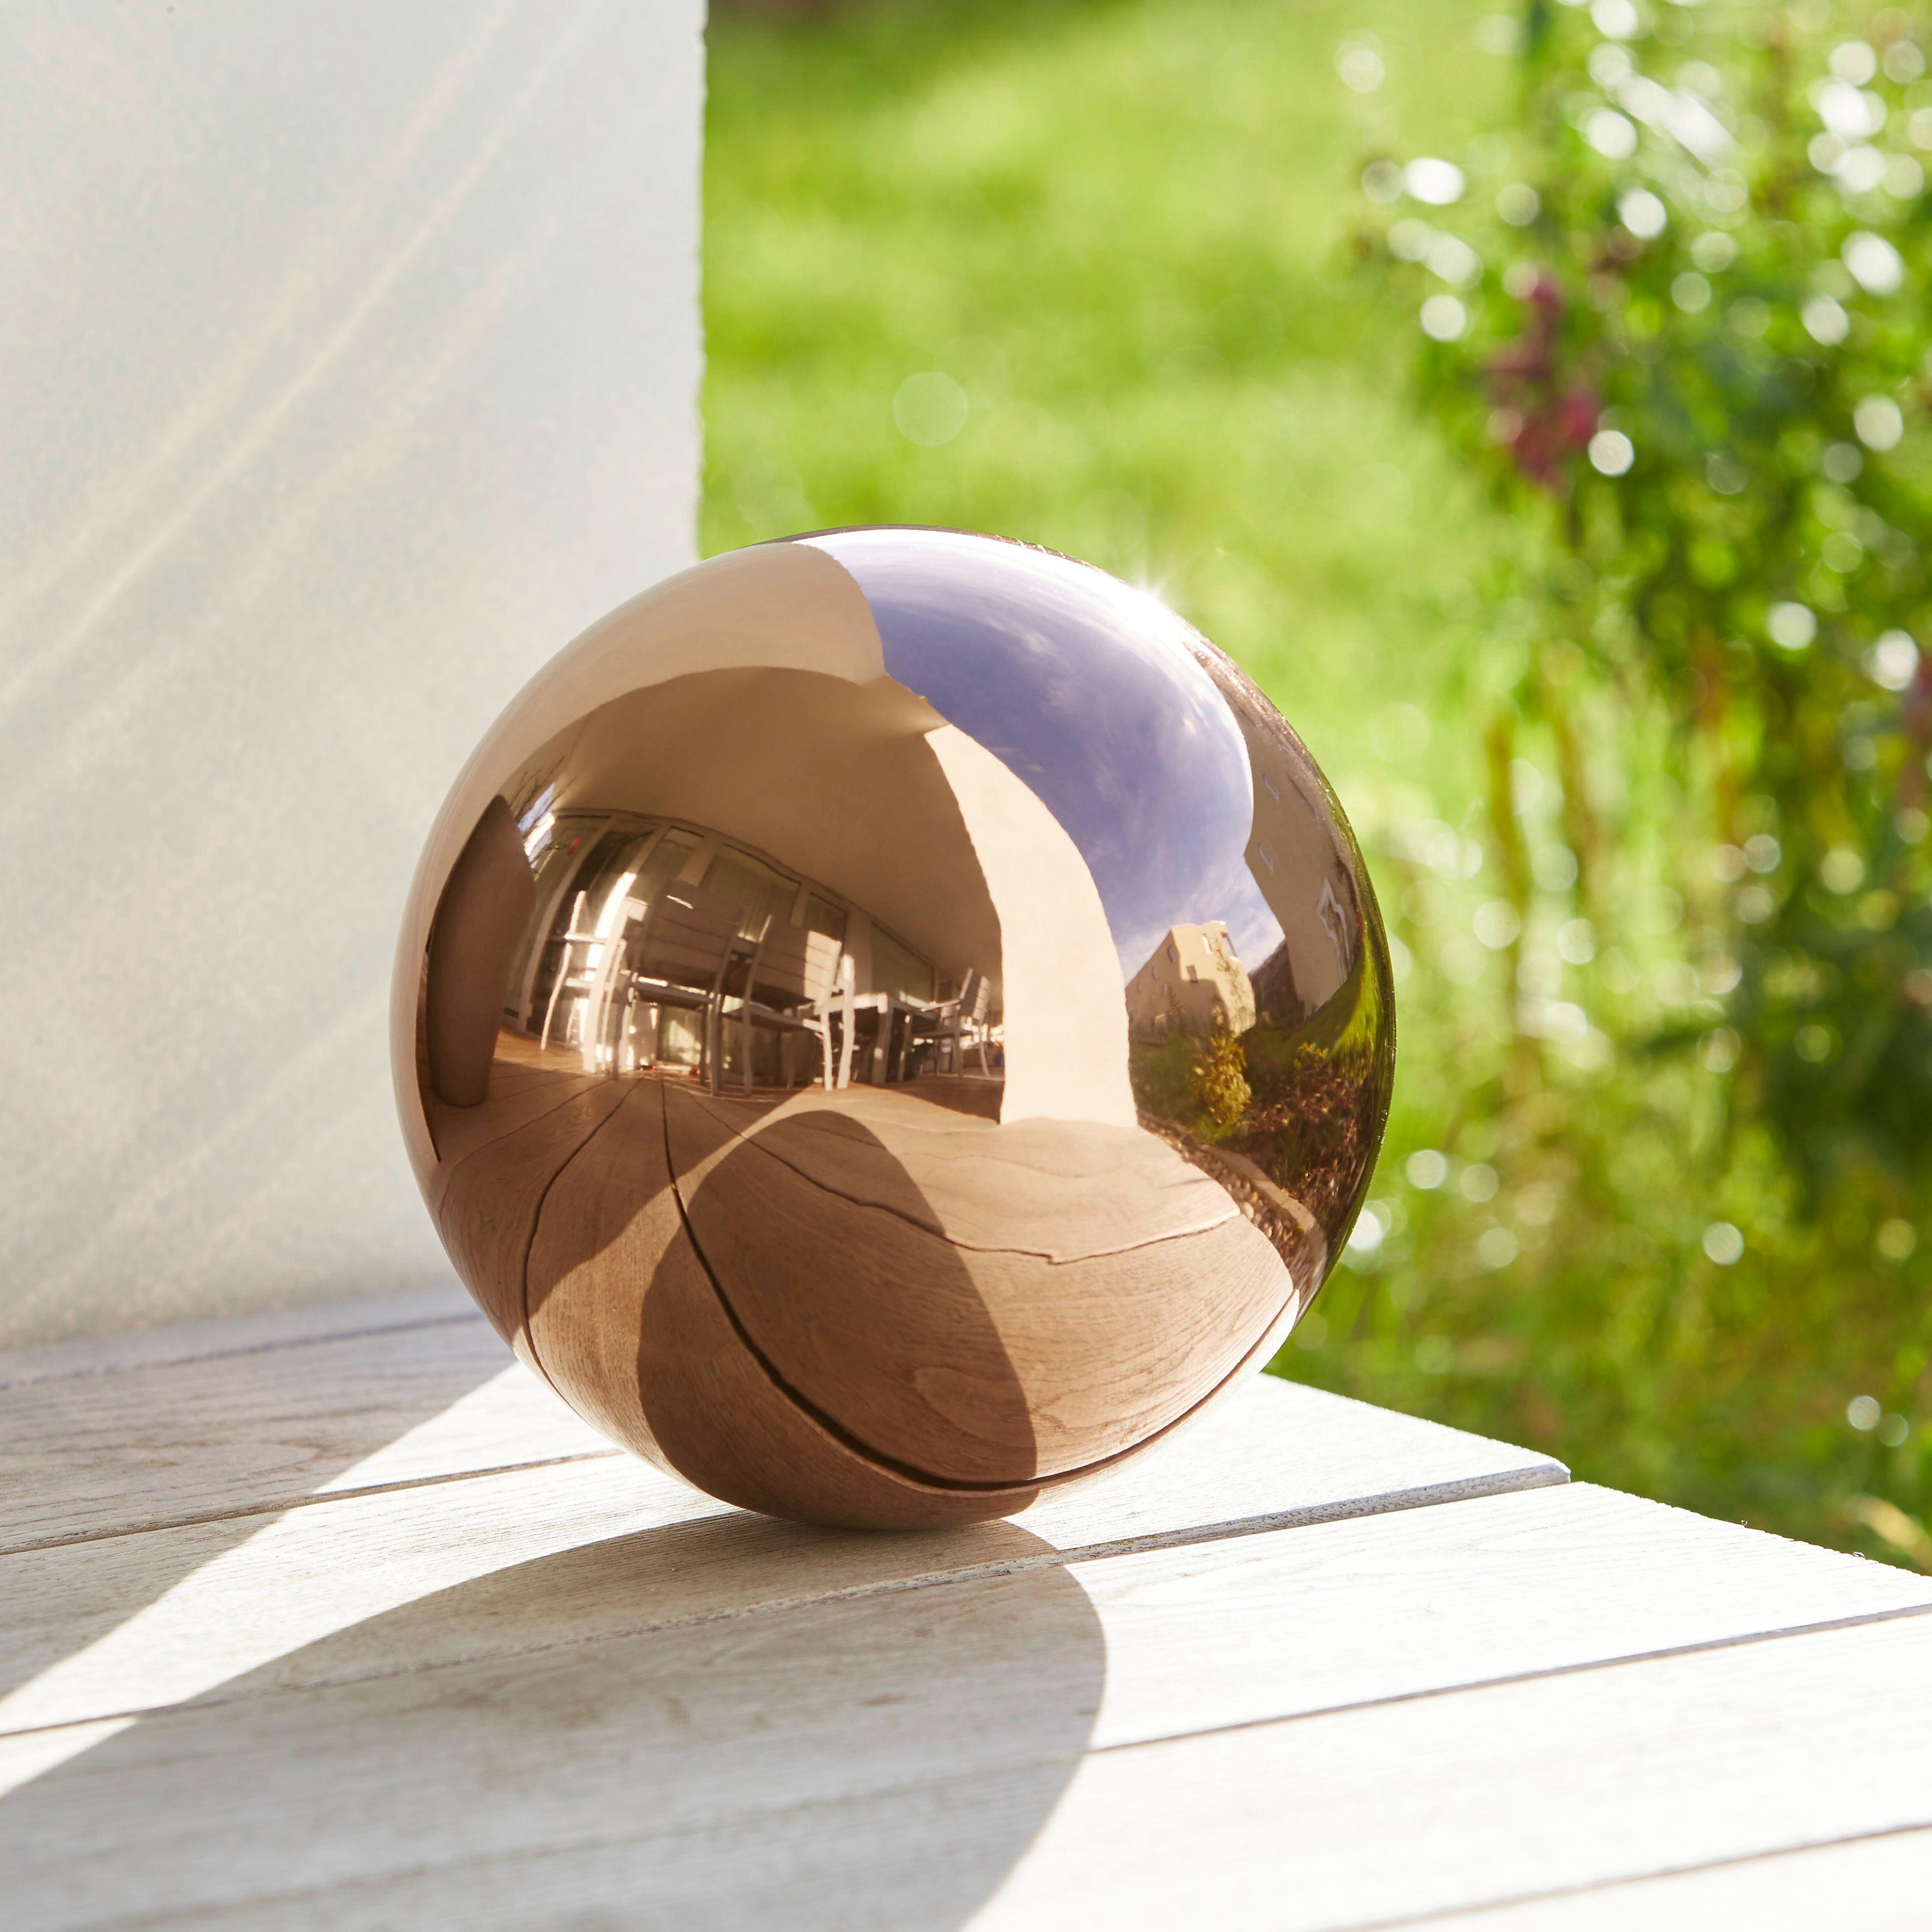 Dekokugel 20 cm Mia - Kupferfarben, Metall (20cm) - MÖMAX modern living